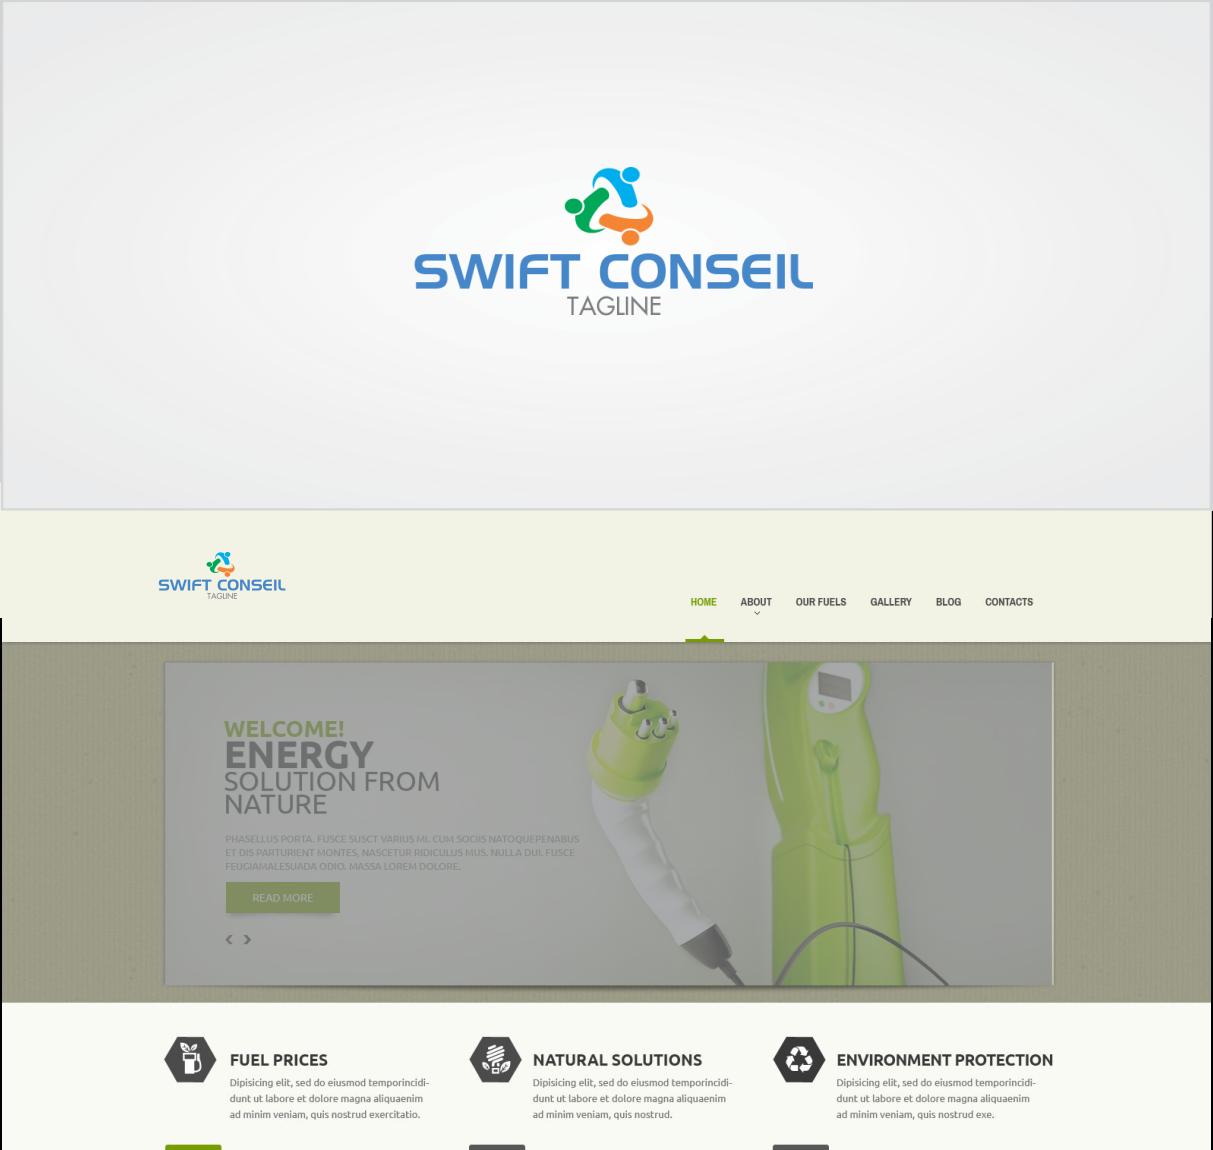 Professional, Upmarket, Consulting Logo Design for SWIFT